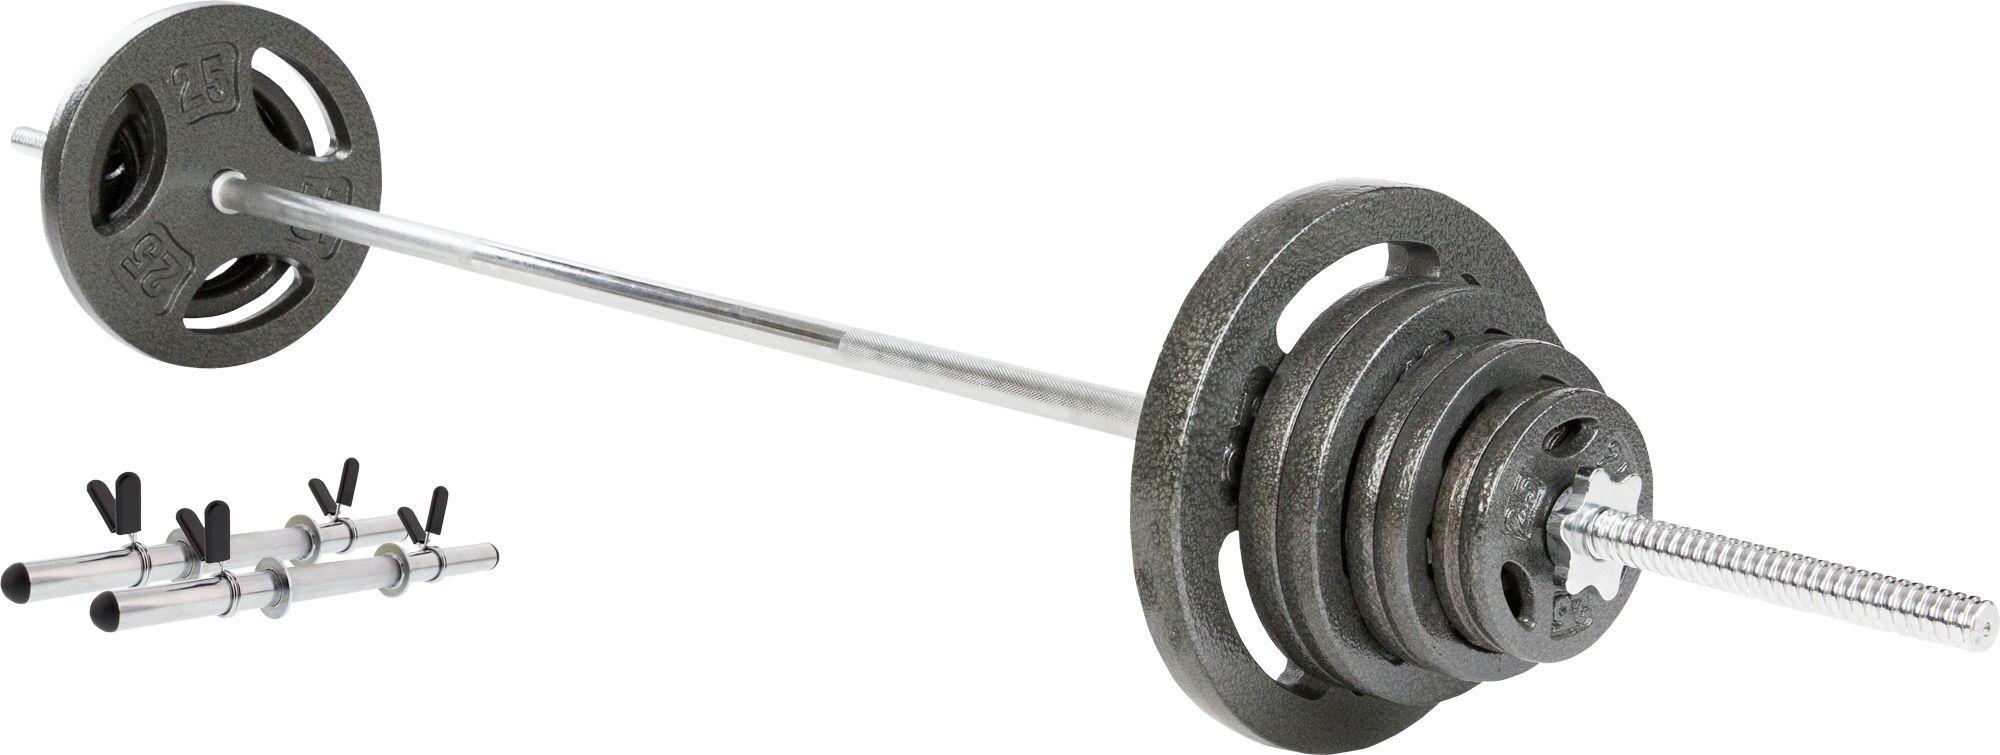 Fitness Gear 135 lb. Barbell Set, Chrome